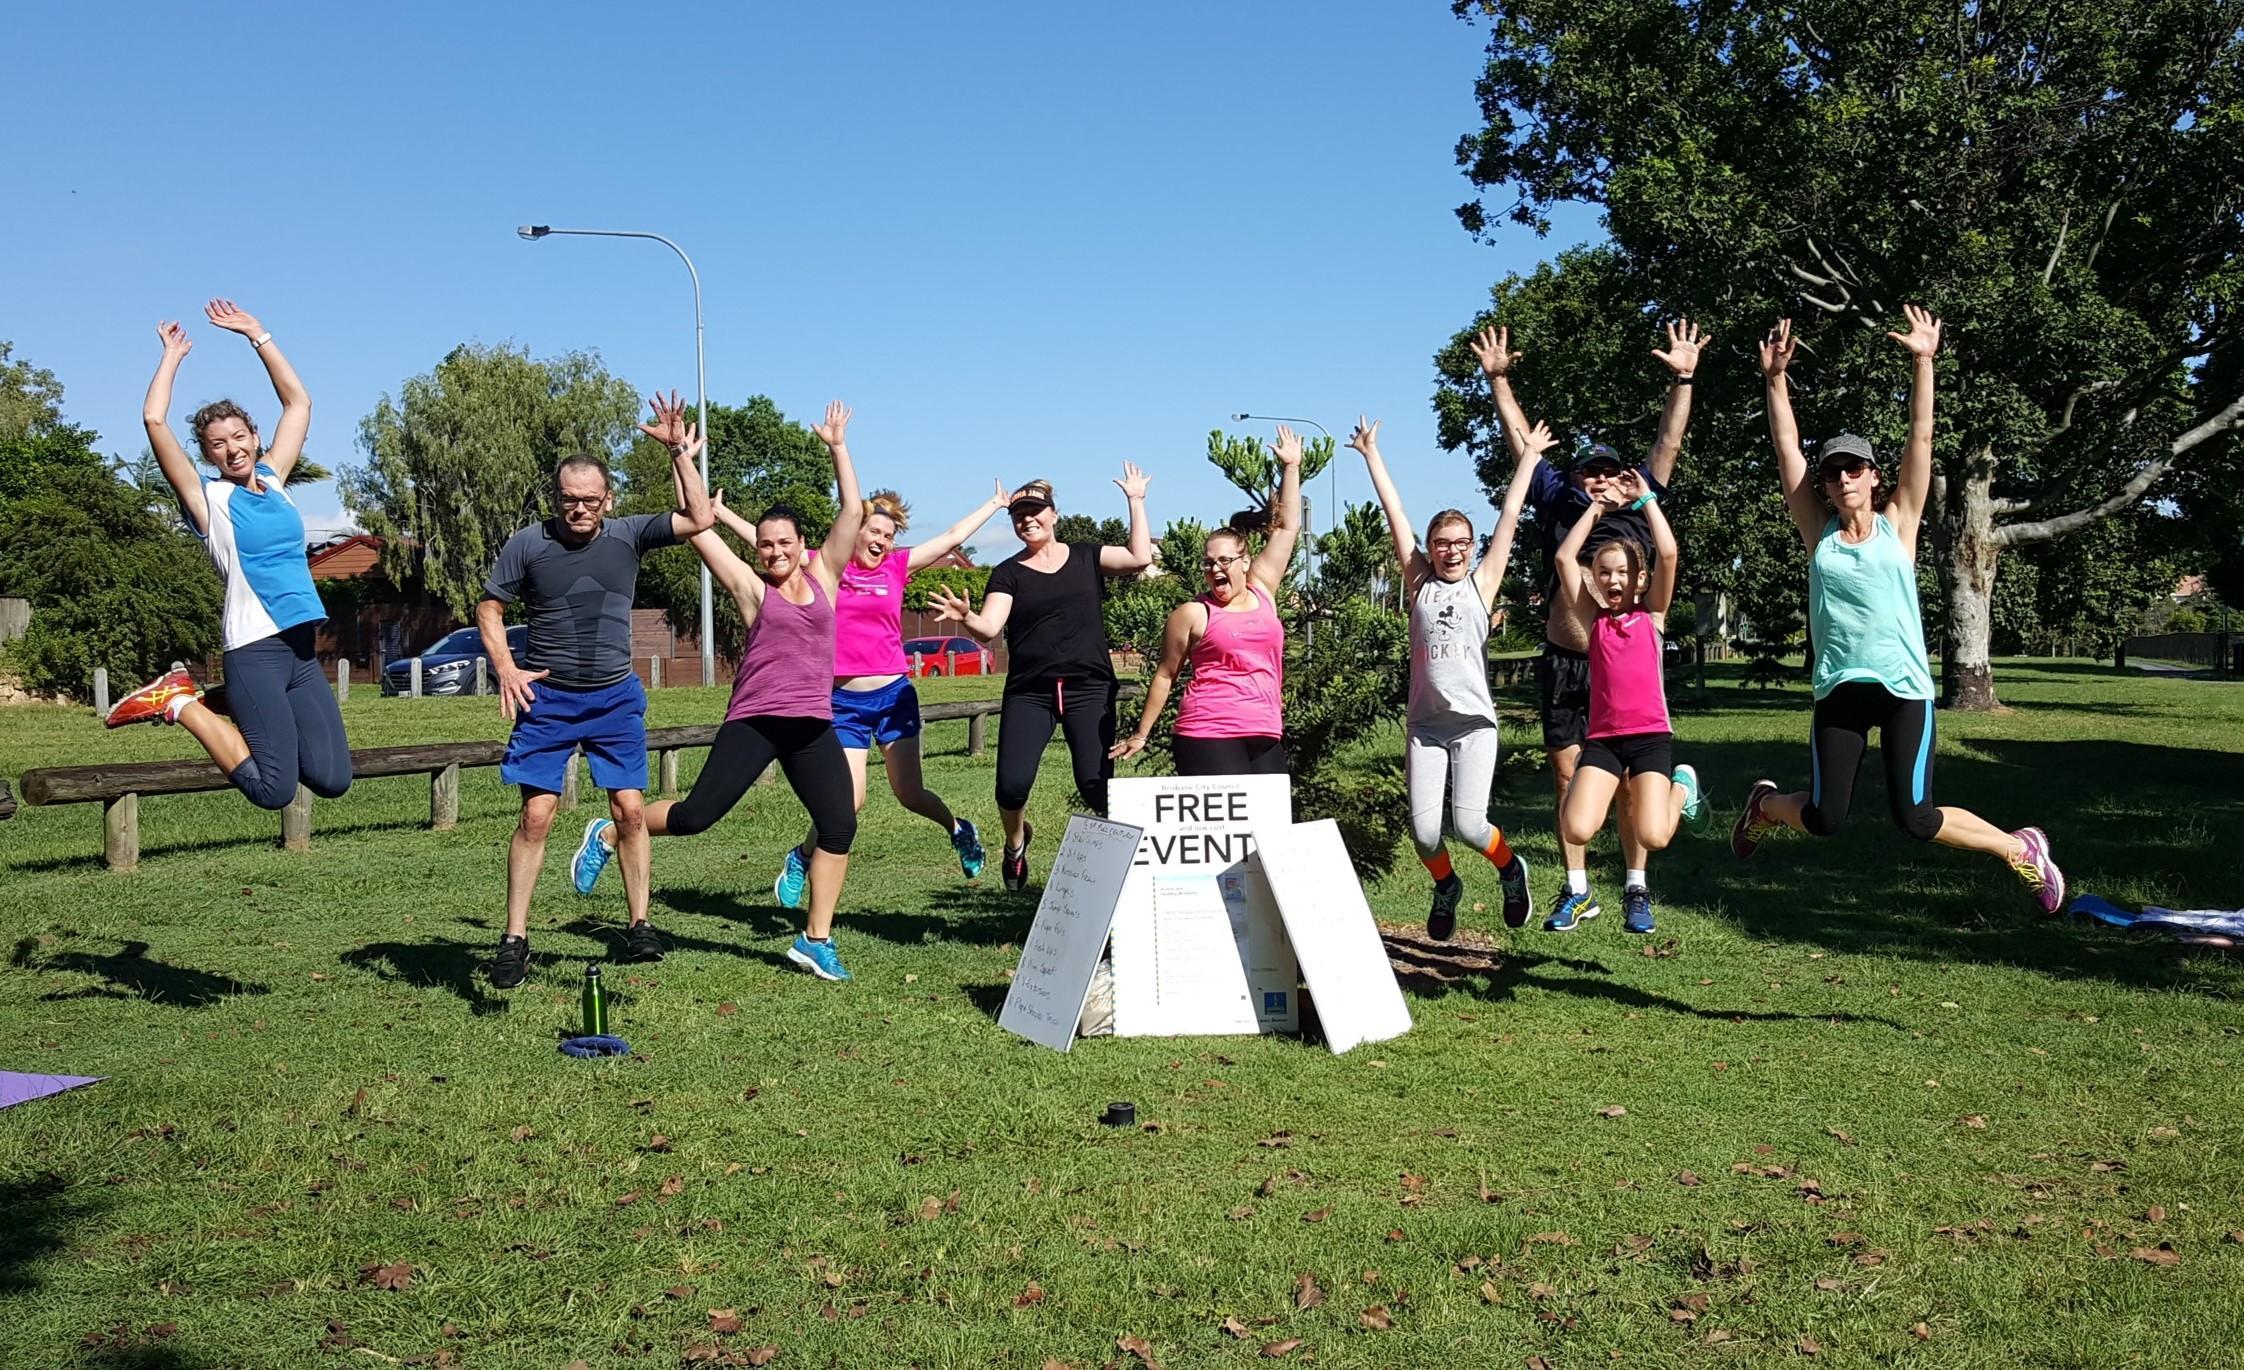 10 week fitness challenge - FREE